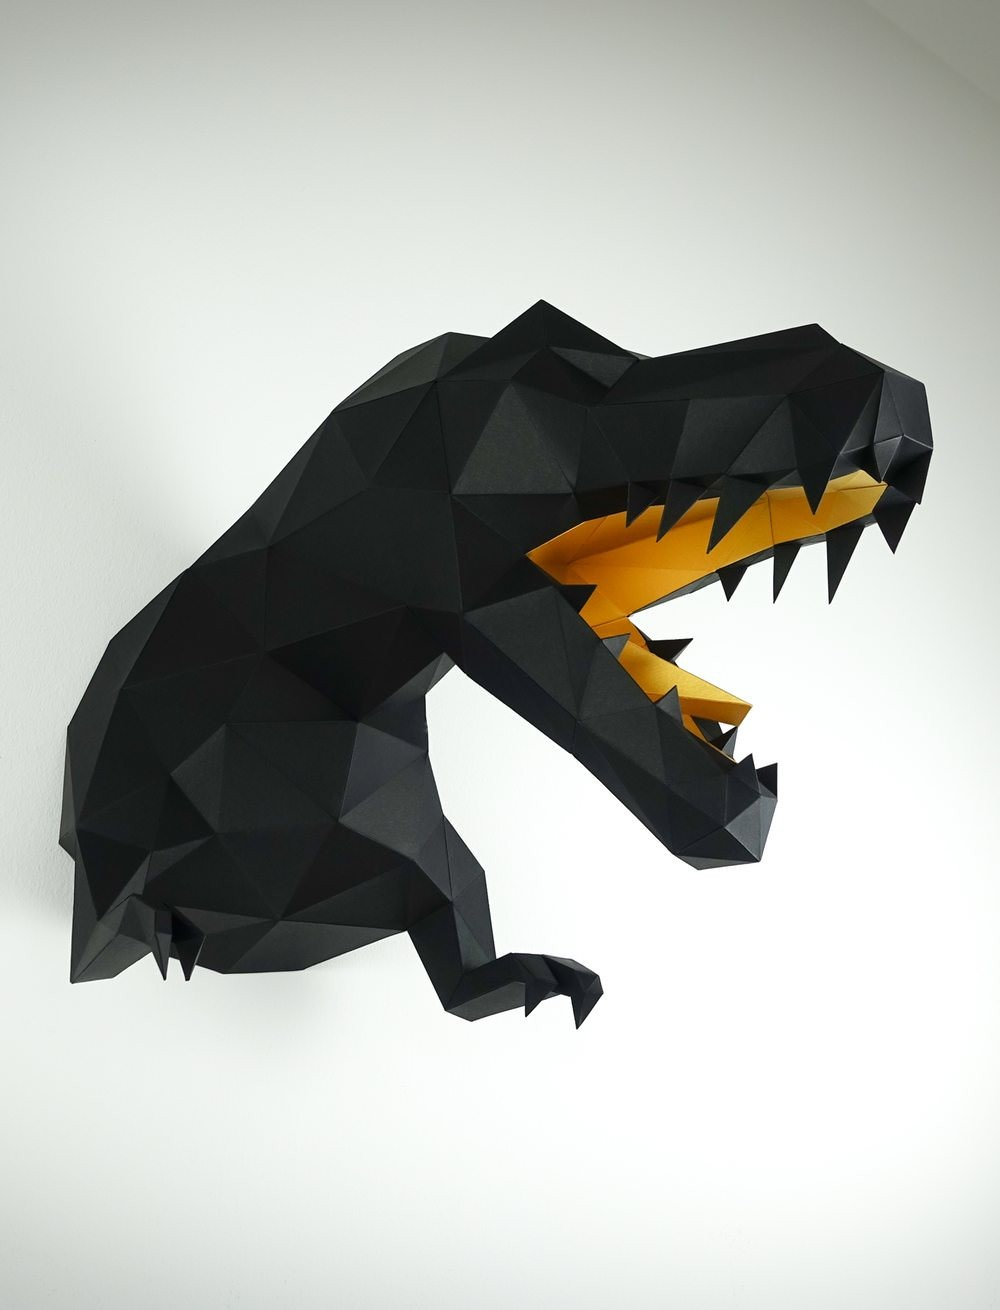 Dragon Papercraft Trex Wanddekoration Wandtrophäe